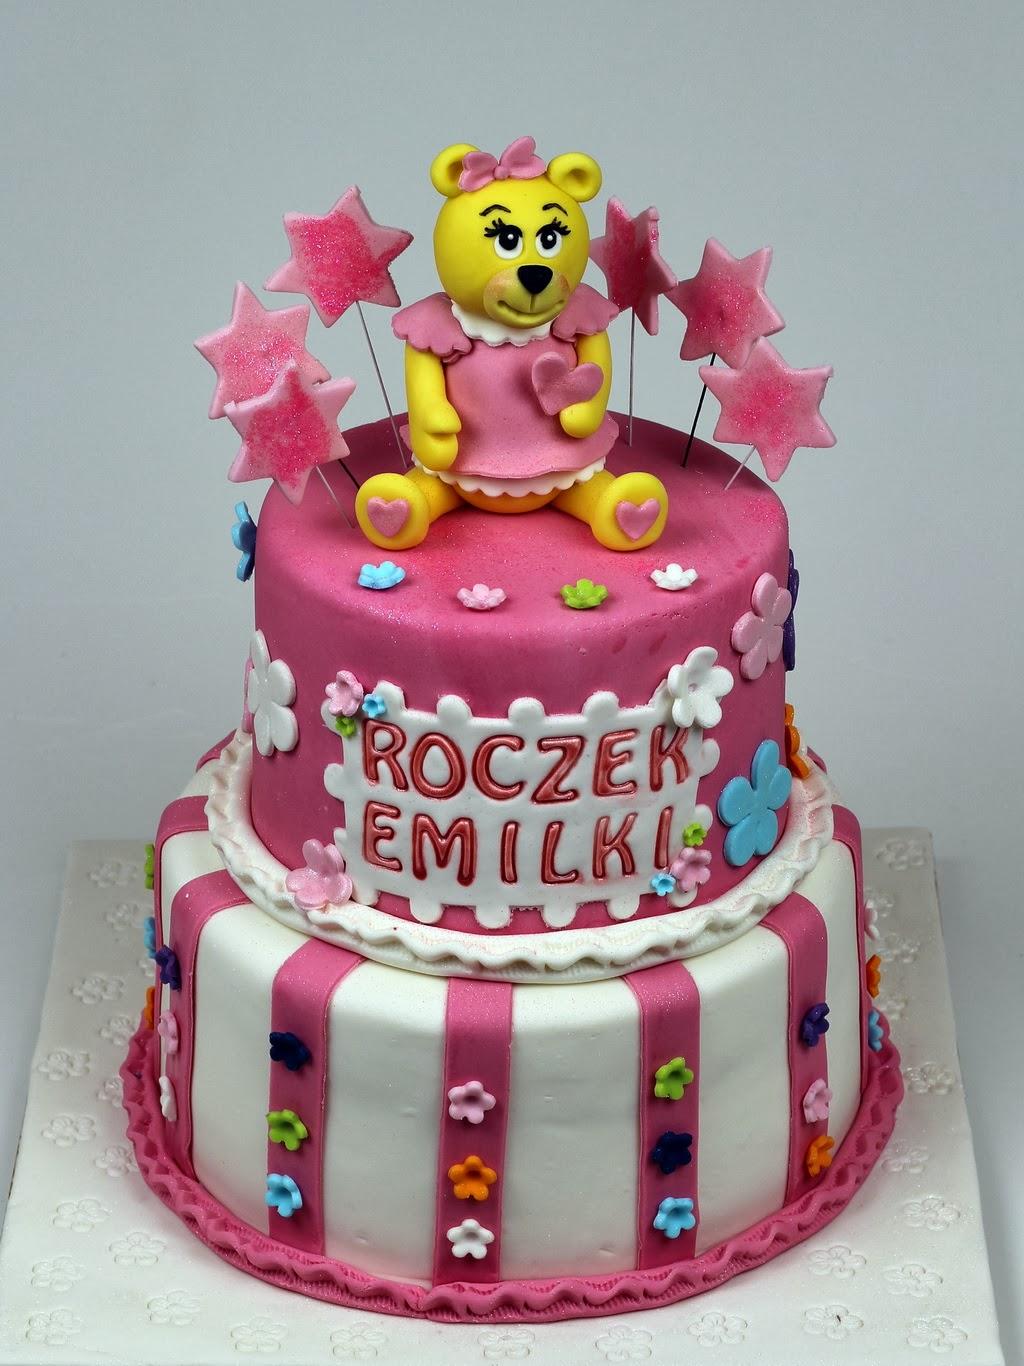 1st Birthday Cake Girl Uk Image Inspiration of Cake and Birthday